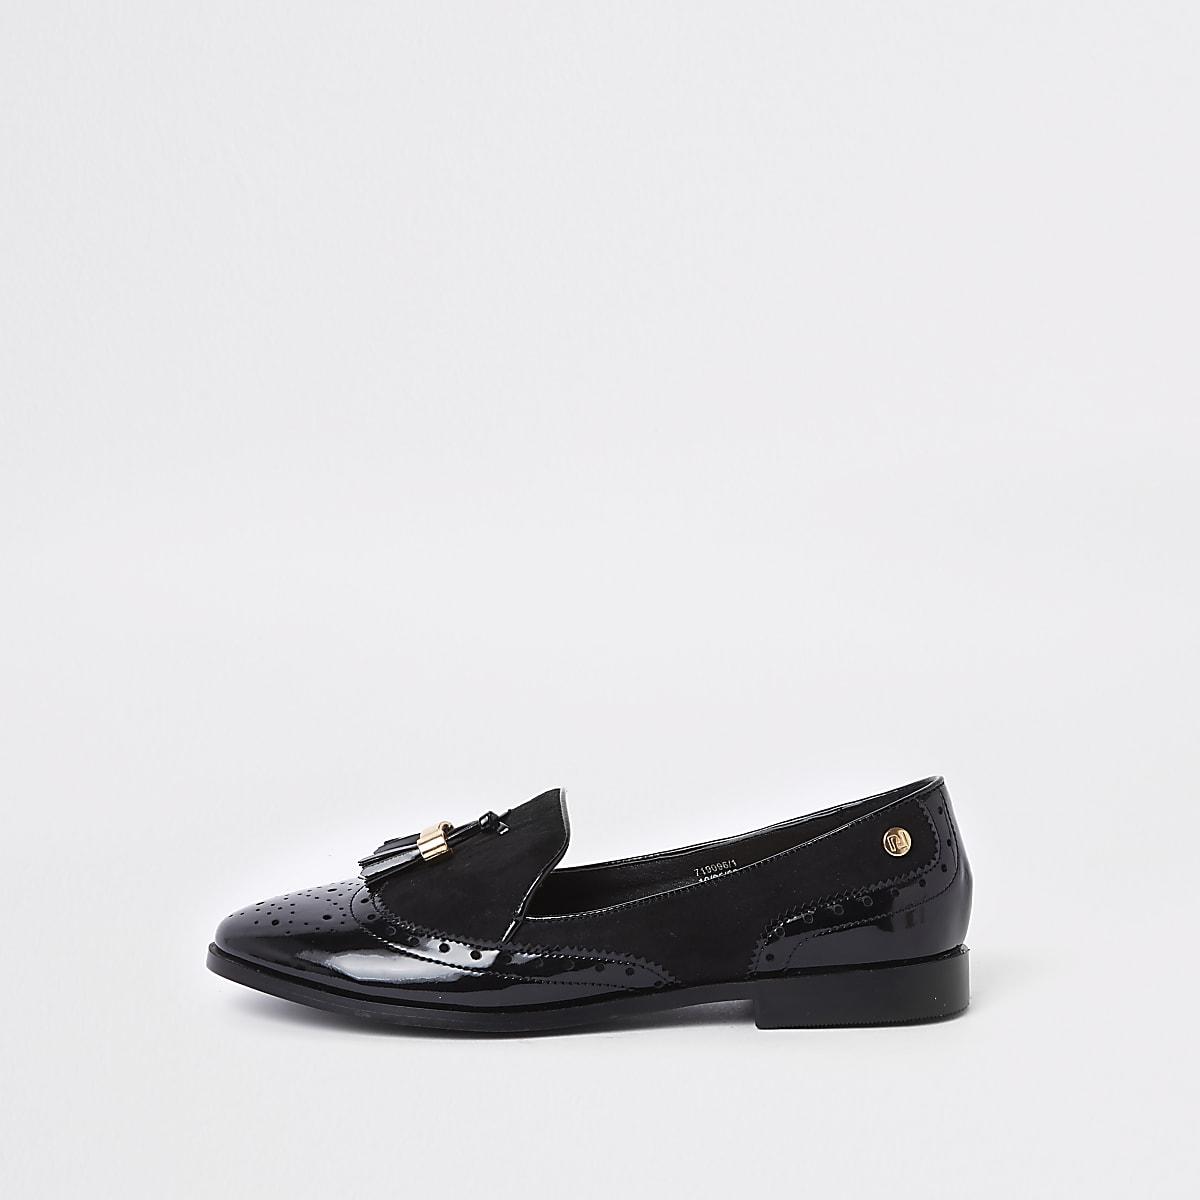 finest selection 7f107 a0d14 Black wide fit tassel patent shoes